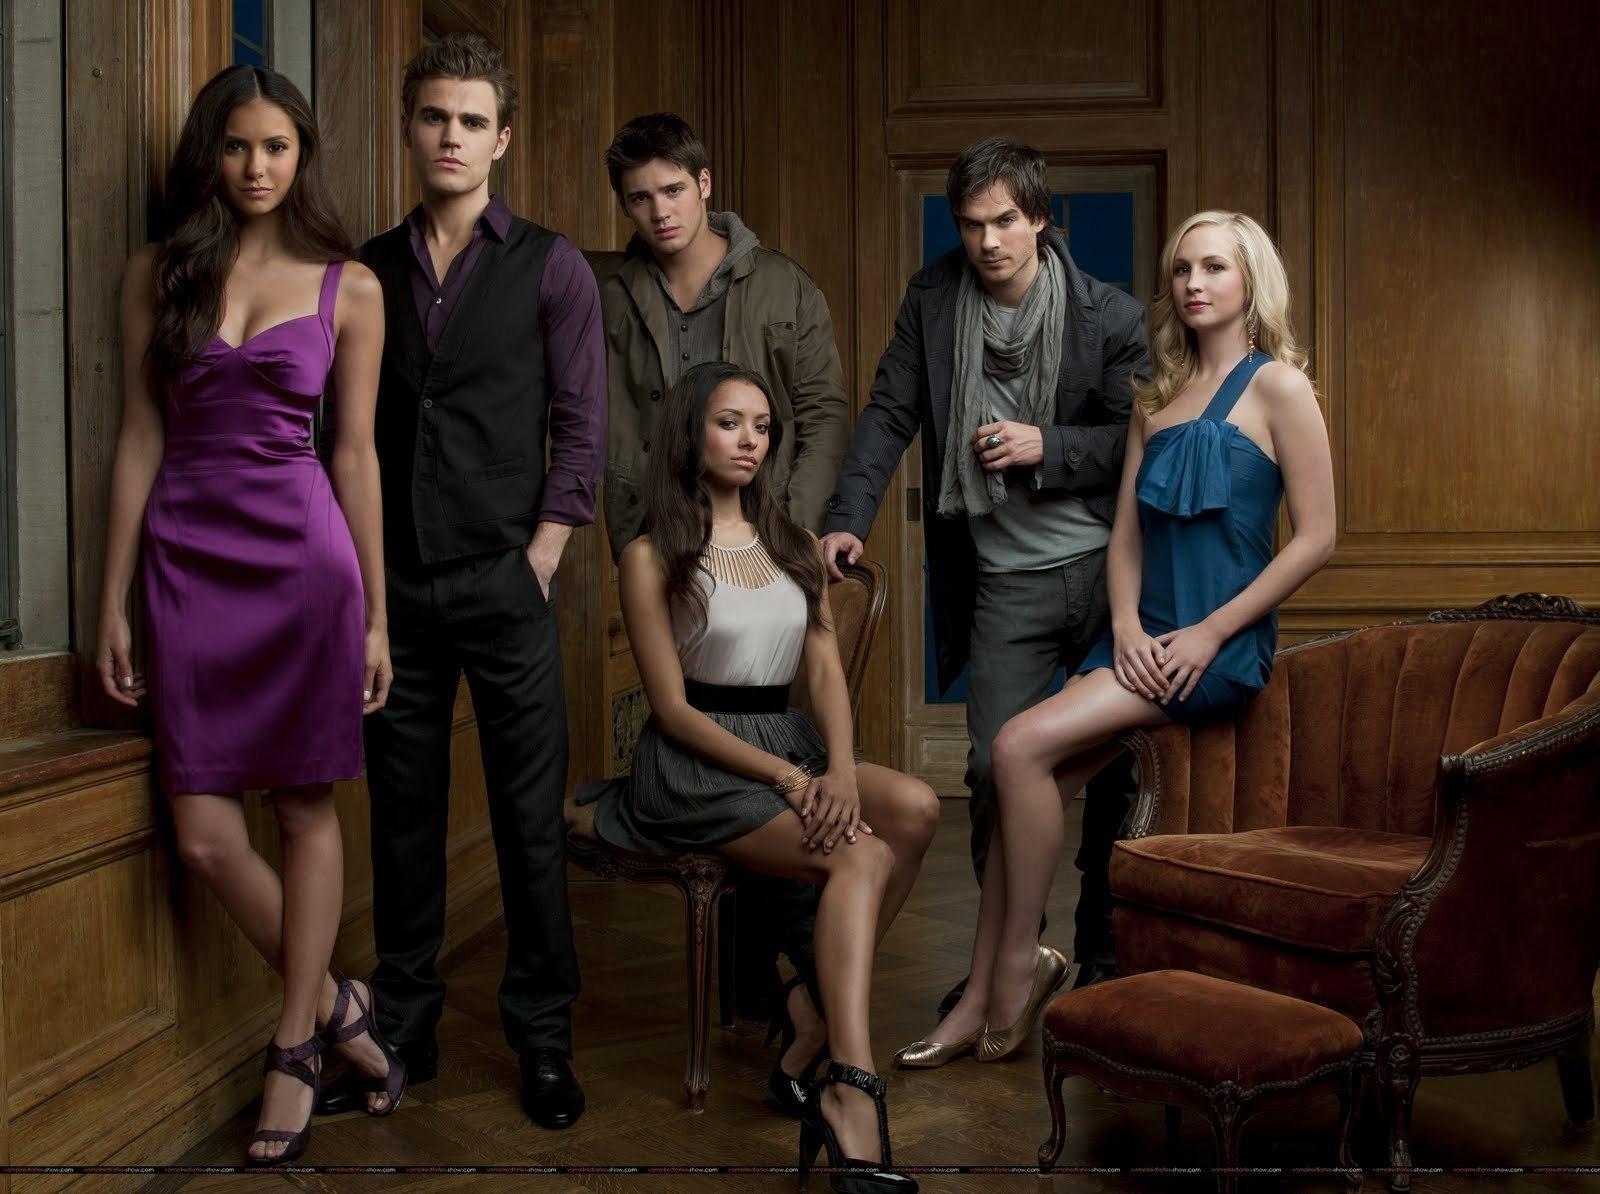 http://2.bp.blogspot.com/_pgEF1Z0olIk/S9BPfYvishI/AAAAAAAAAMo/Z6dx0M9RBNg/s1600/Vampire-Diaries-Main-Cast-the-vampire-diaries-8706262-1600-1194.jpg